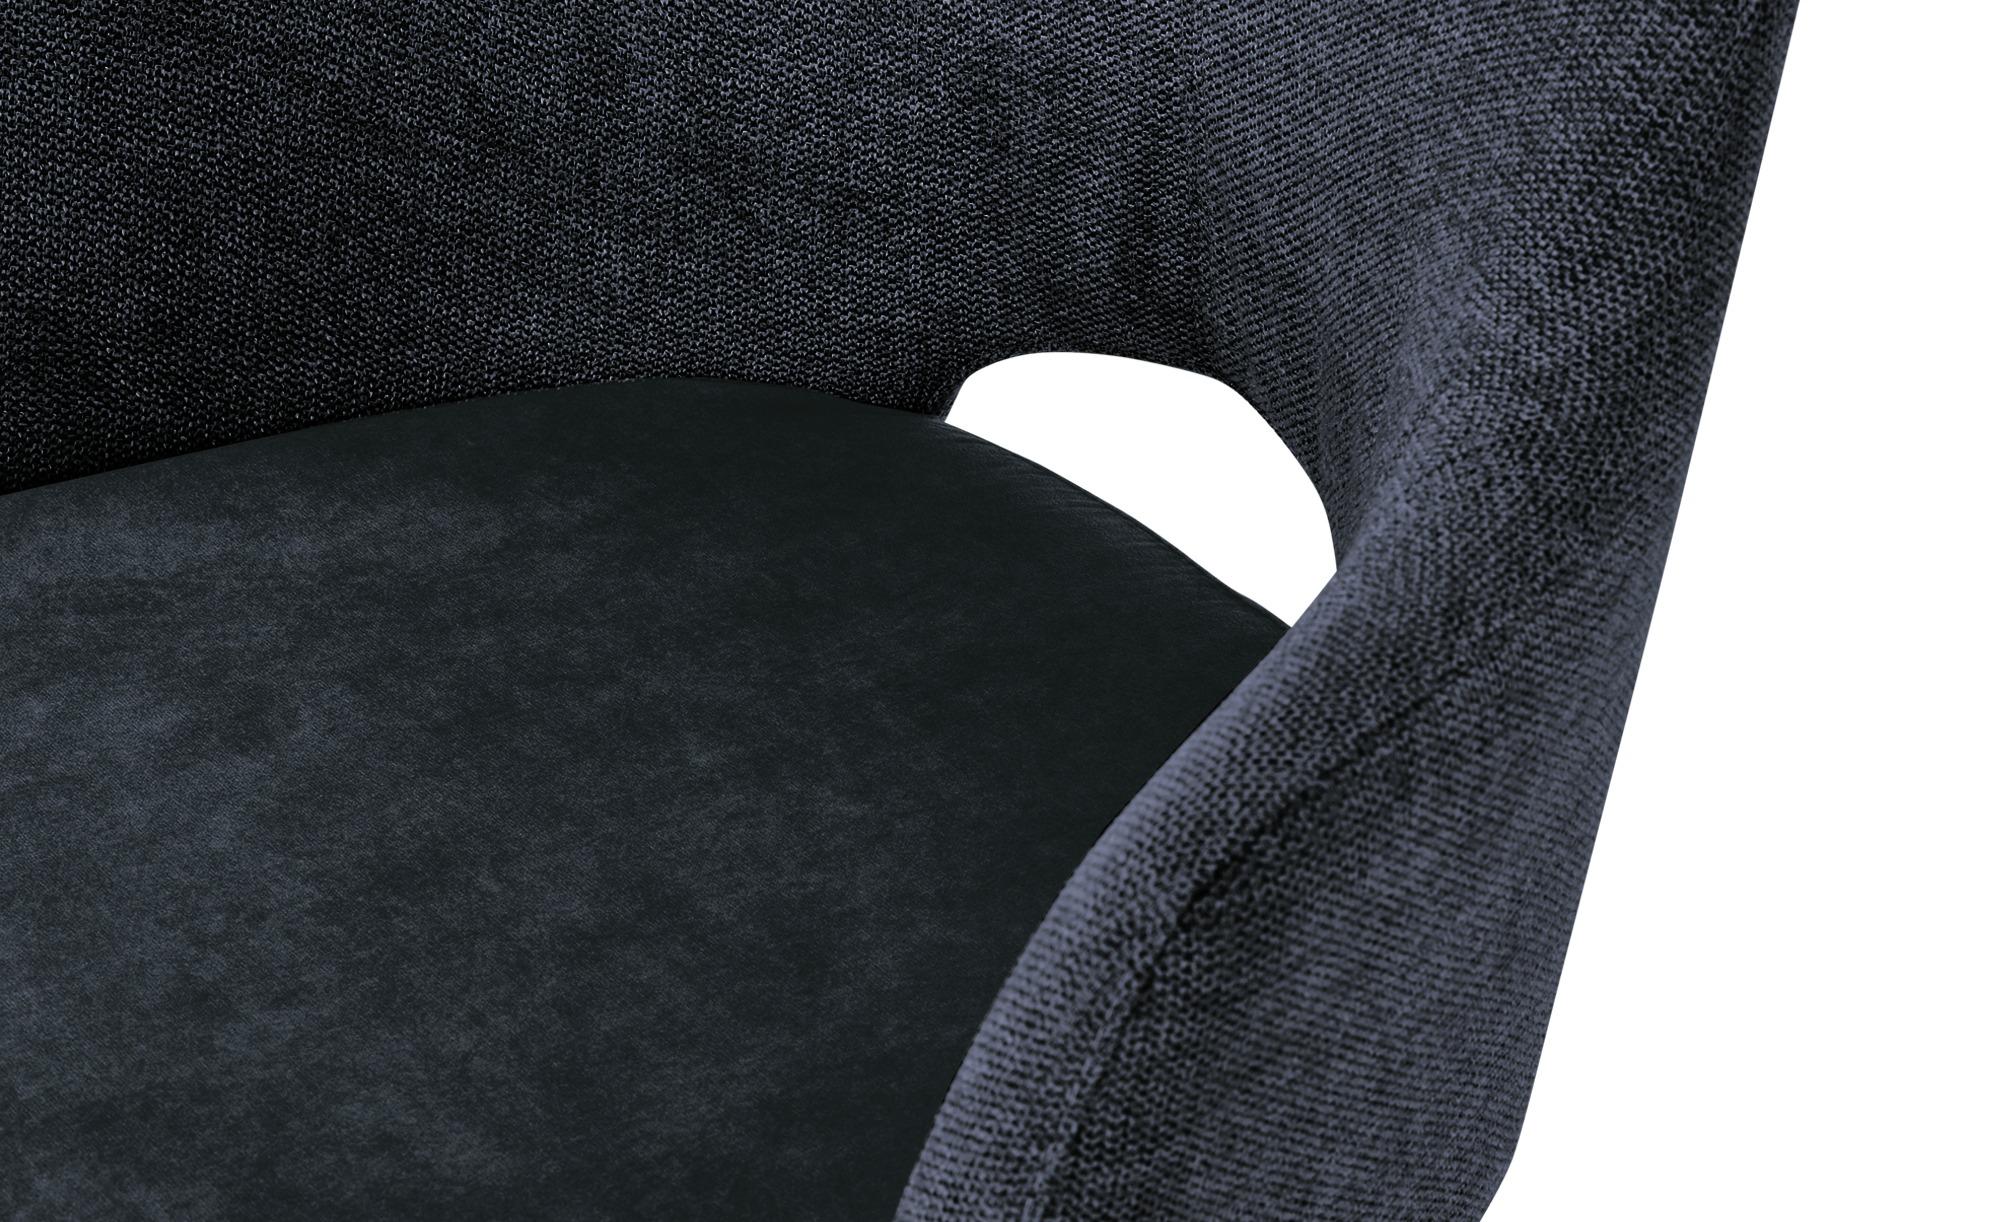 Woodford Sessel  Moreda ¦ blau ¦ Maße (cm): B: 58 H: 82 T: 60 Stühle > Esszimmerstühle > Esszimmerstühle mit Armlehnen - Höffner